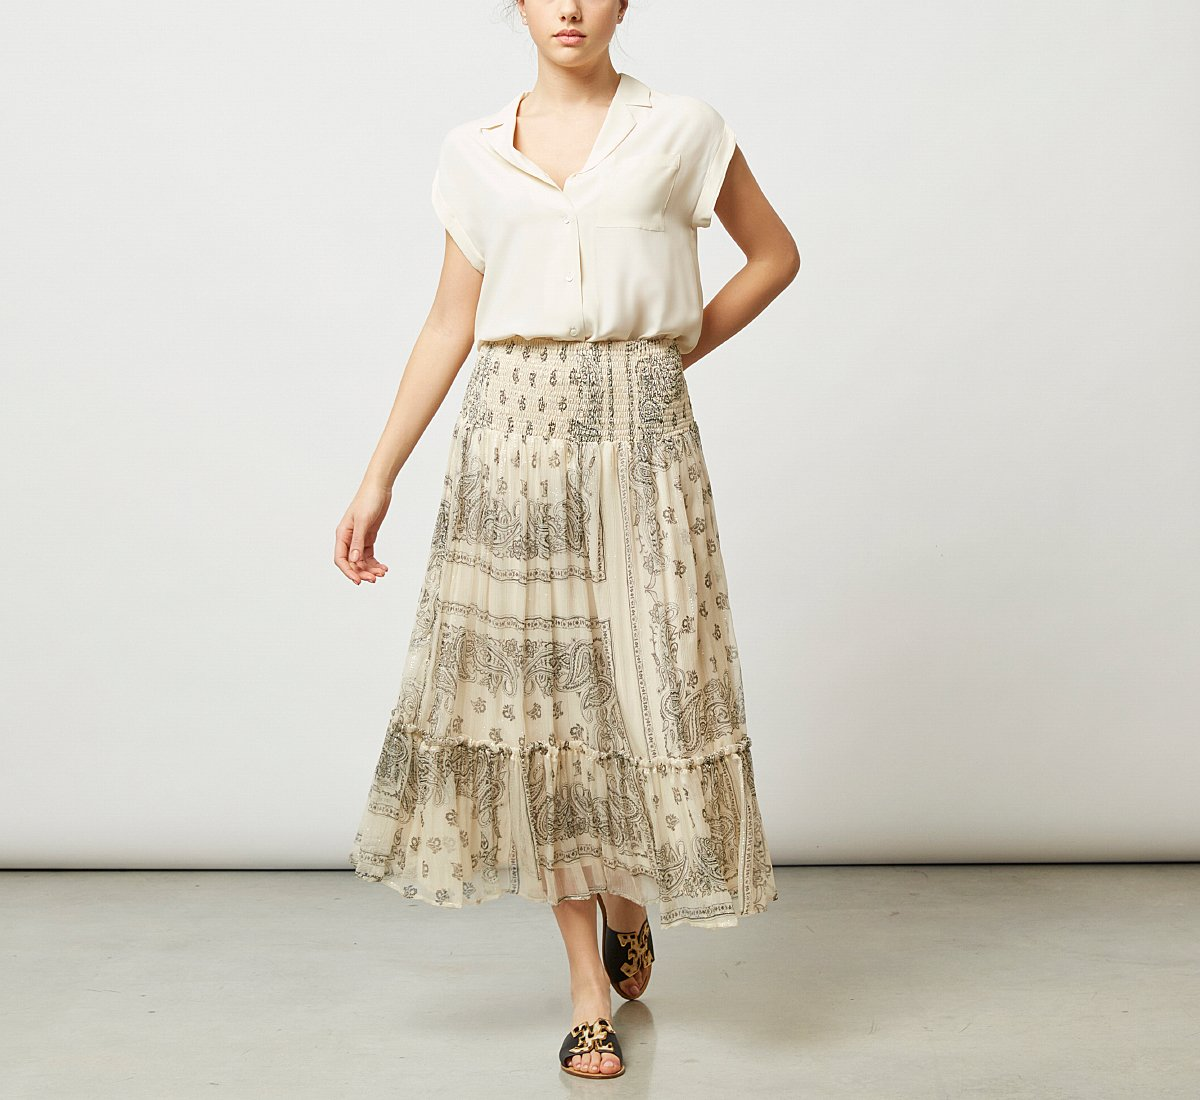 Loose-fitting skirt